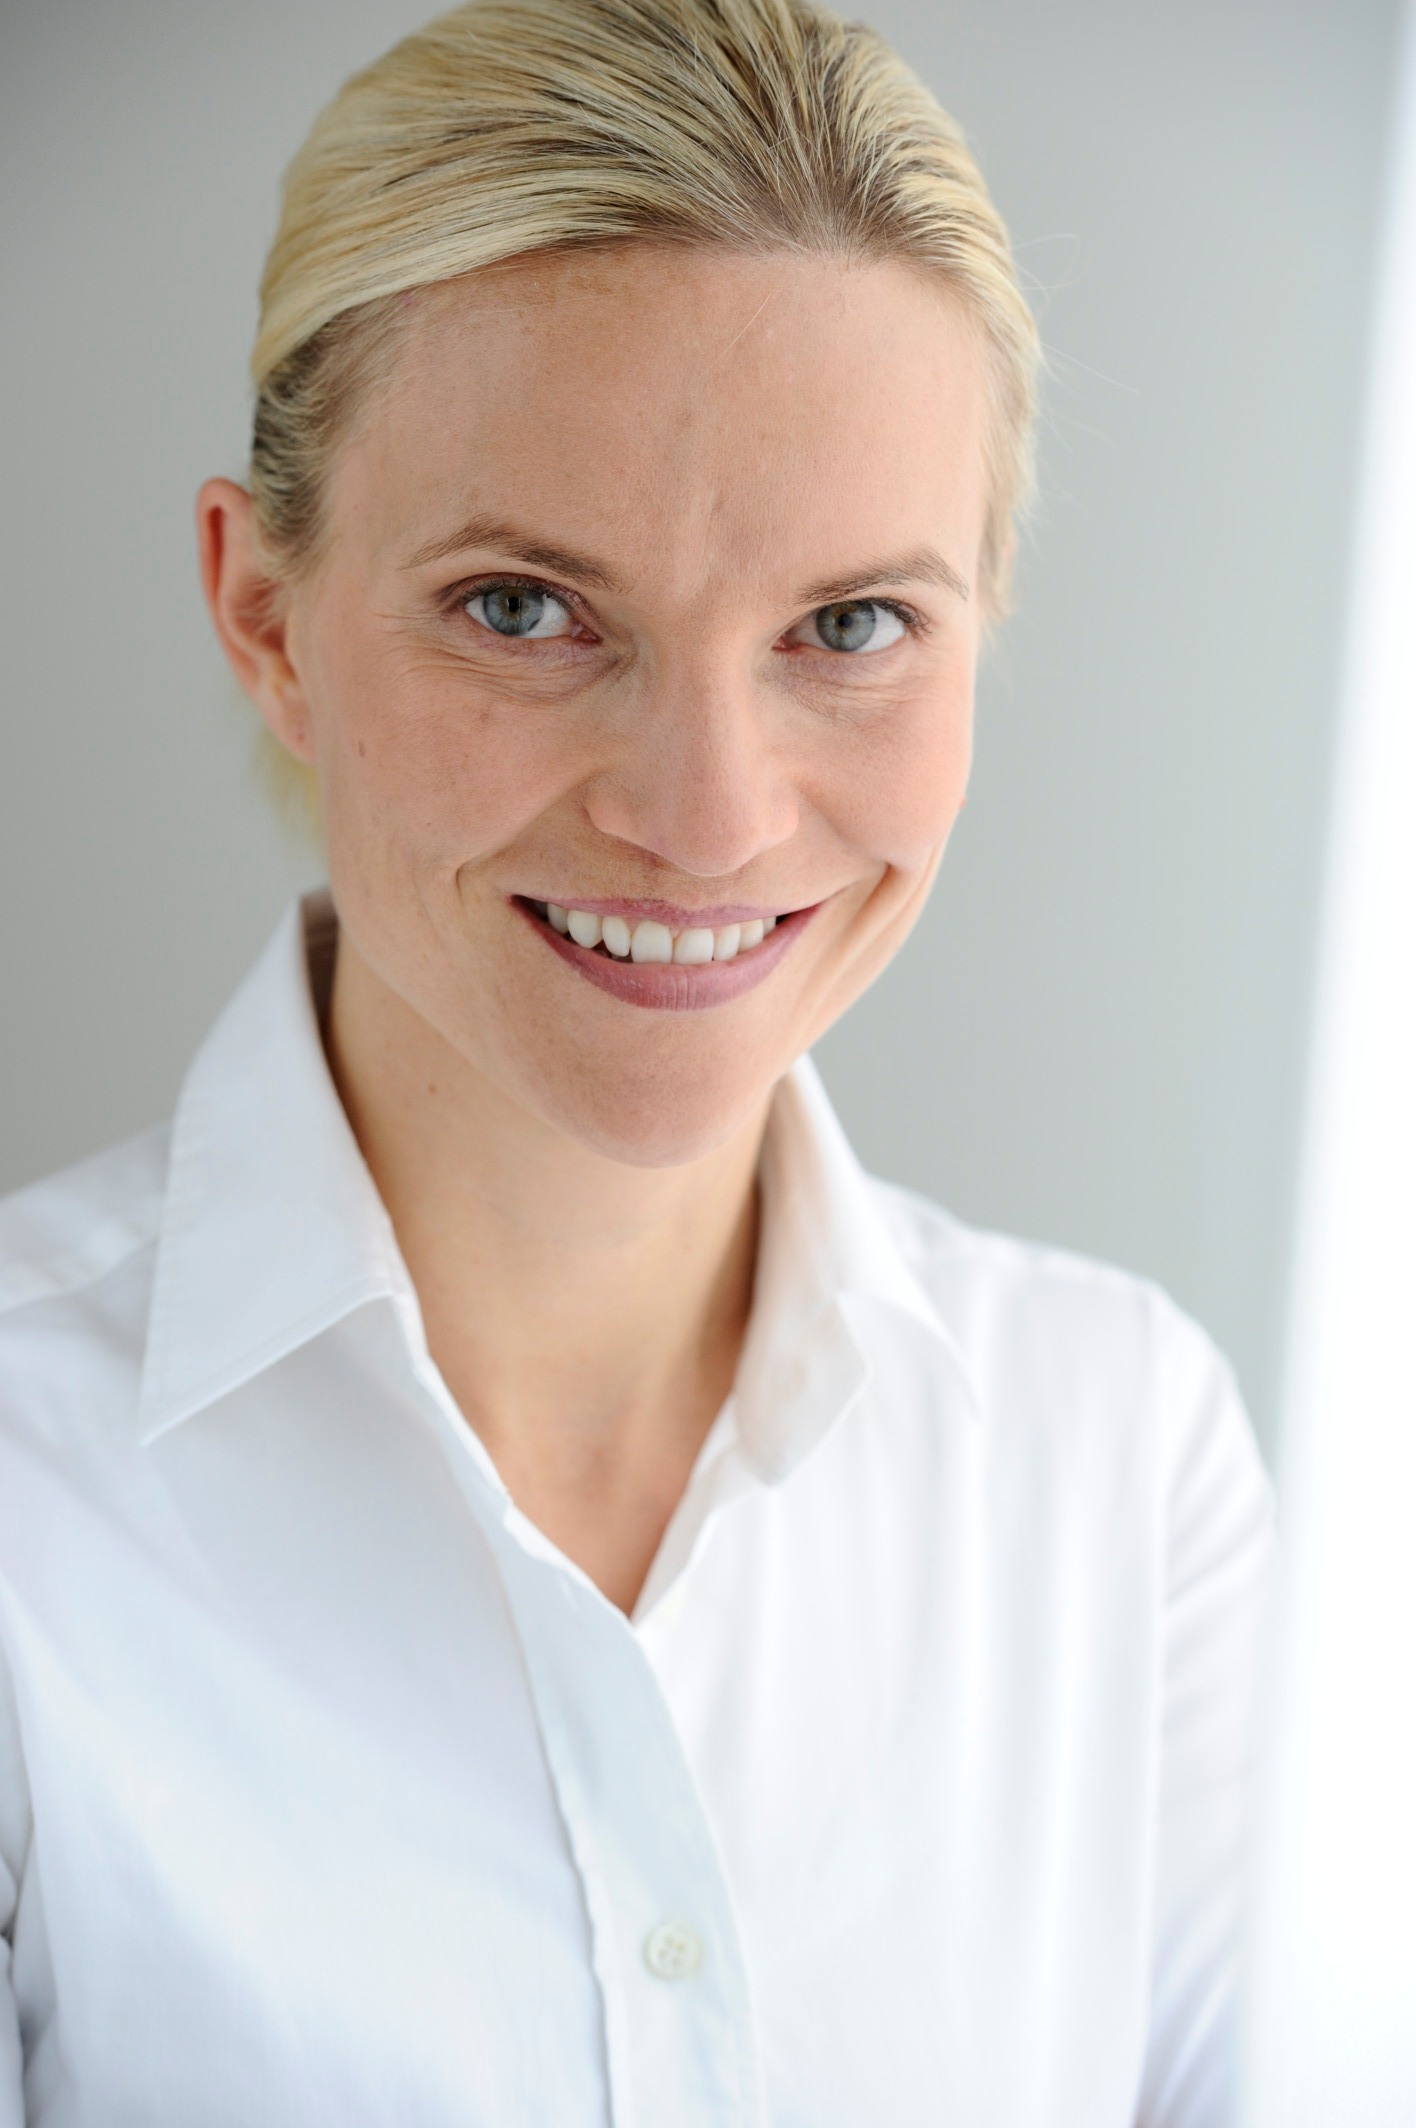 Hautärztin Frau Dr. Alexandra Ogilvie in München